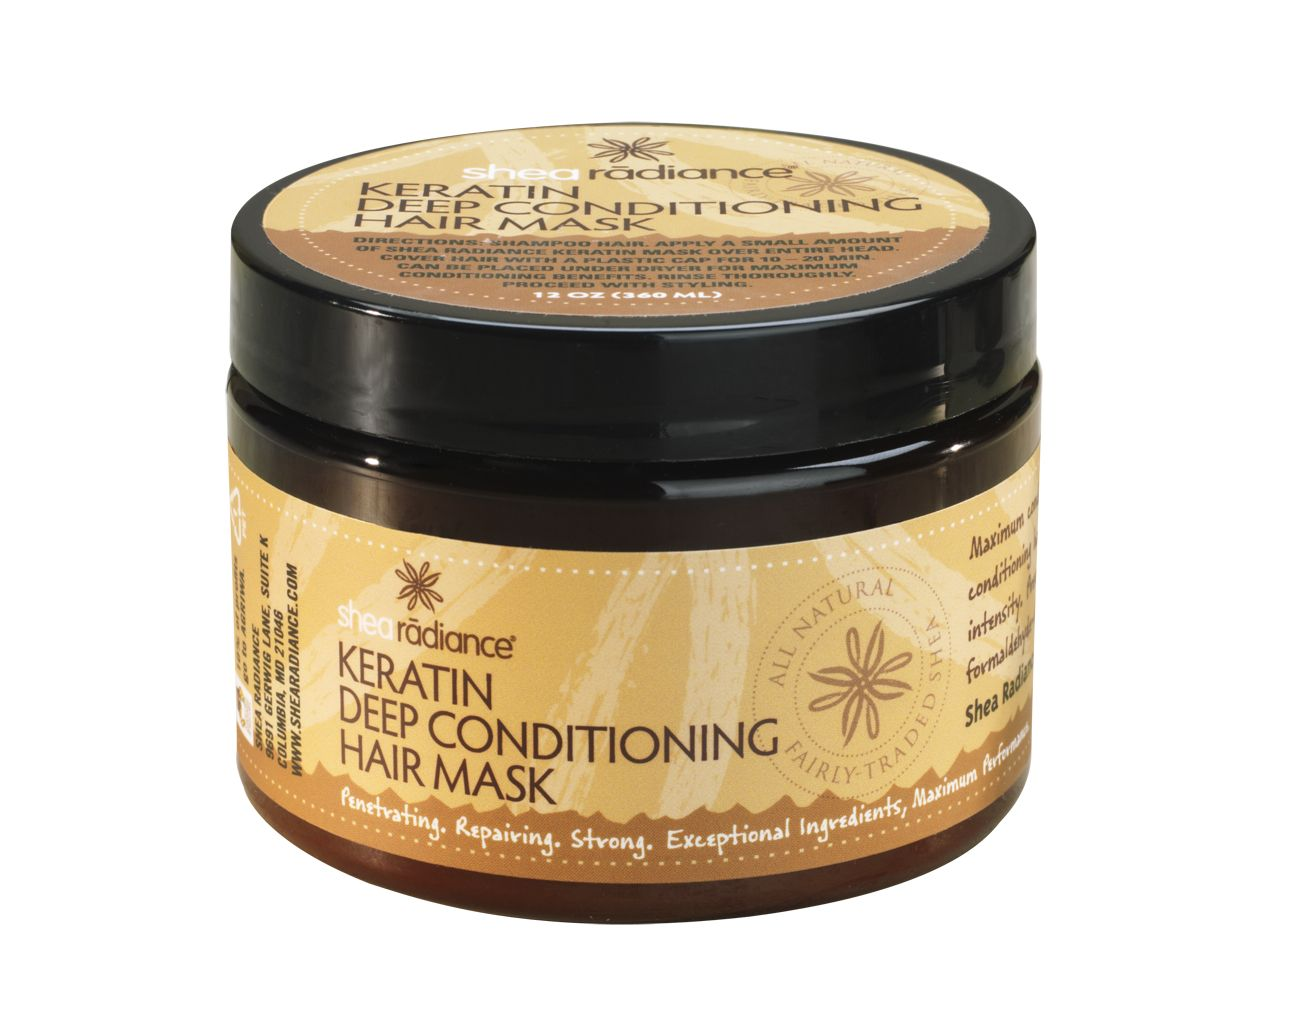 Keratin Deep Conditioning Hair Mask Deep conditioning